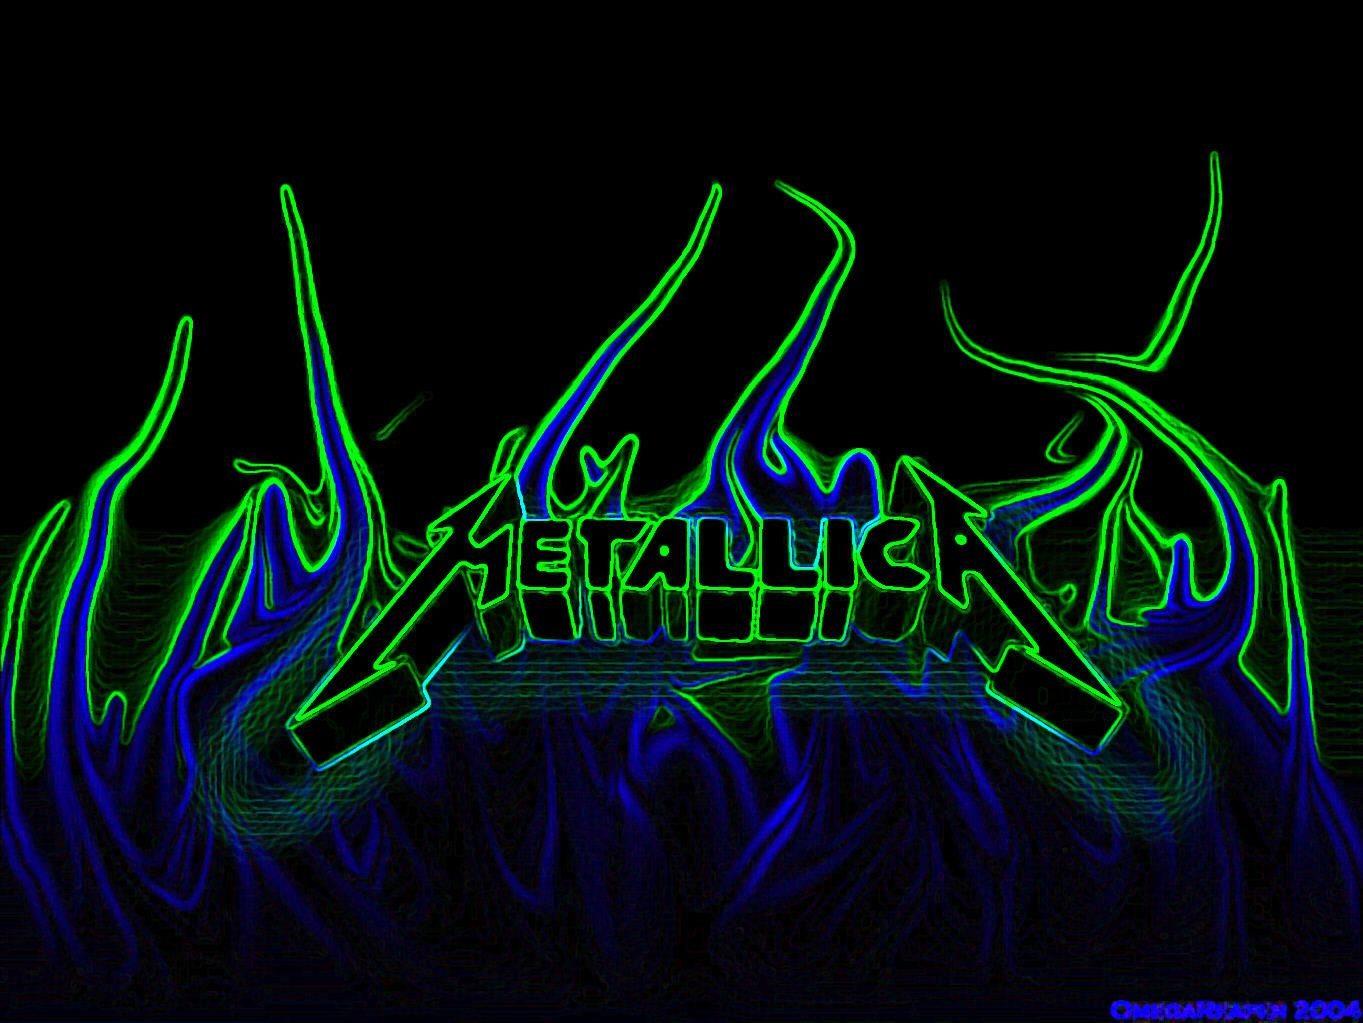 Page : Full HD p Metallica Wallpapers HD, Desktop Backgrounds 1363×1023 Metalica Wallpapers (40 Wallpapers) | Adorable Wallpapers